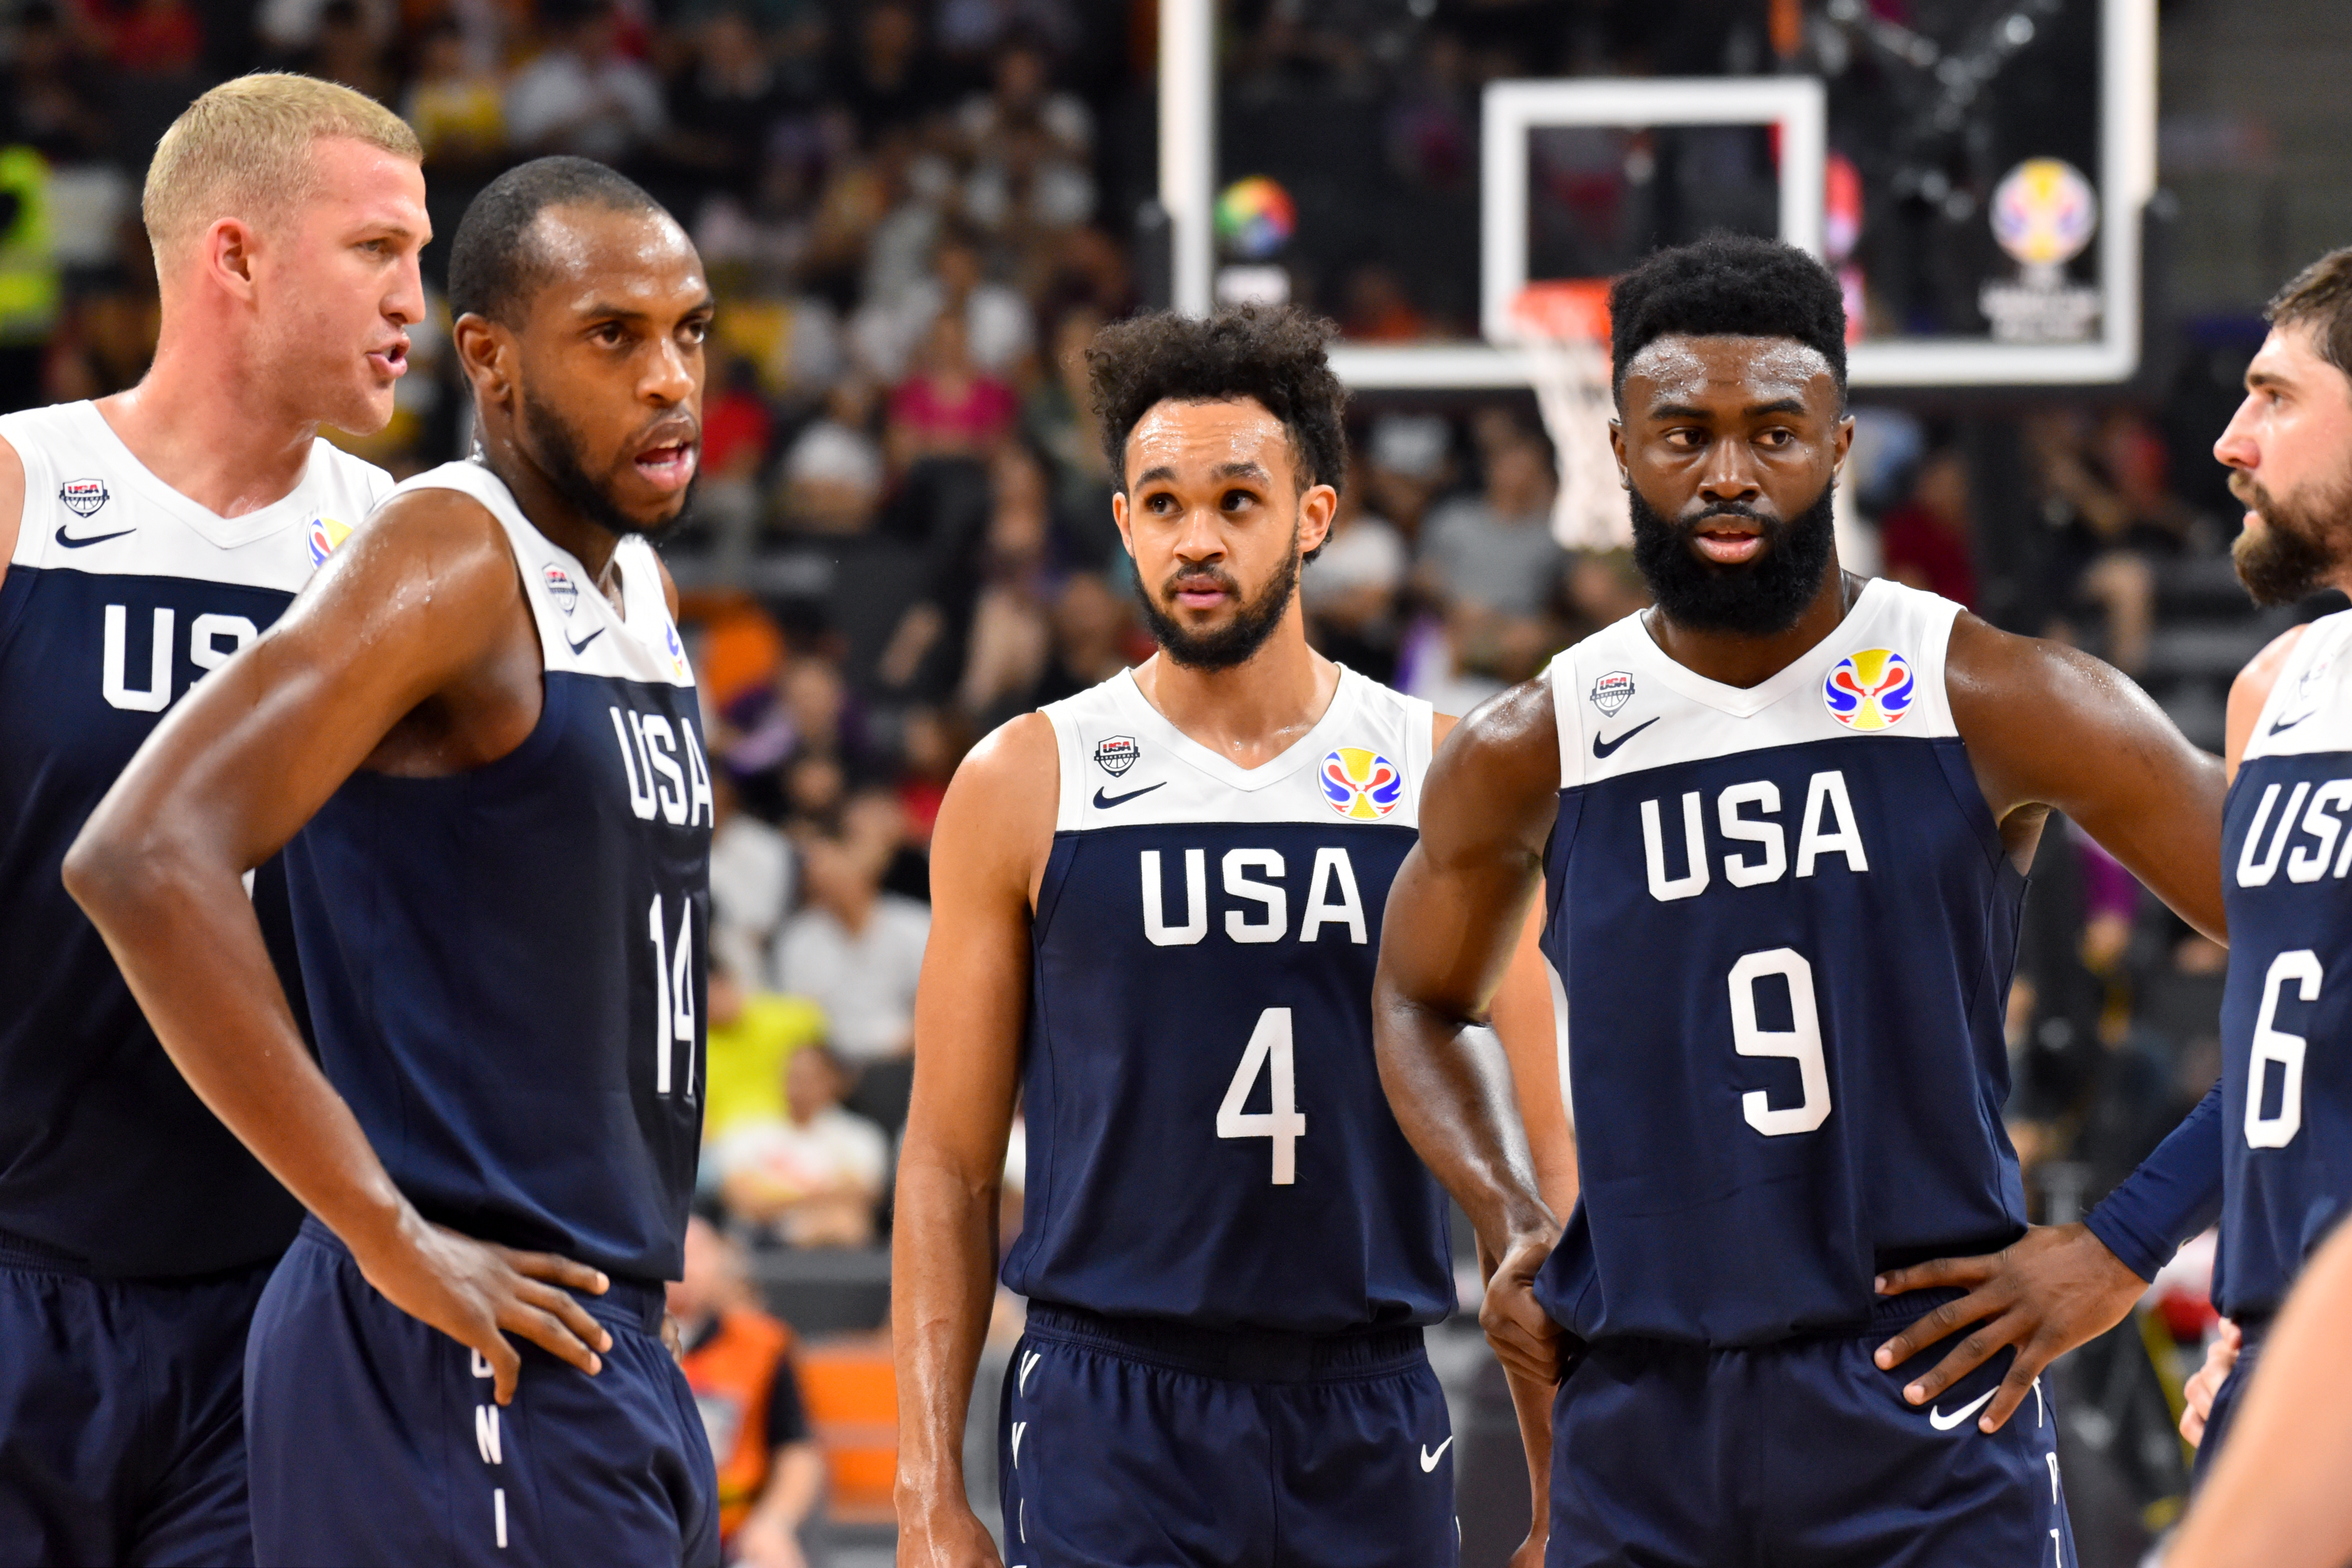 2019 FIBA World Cup - Serbia v USA